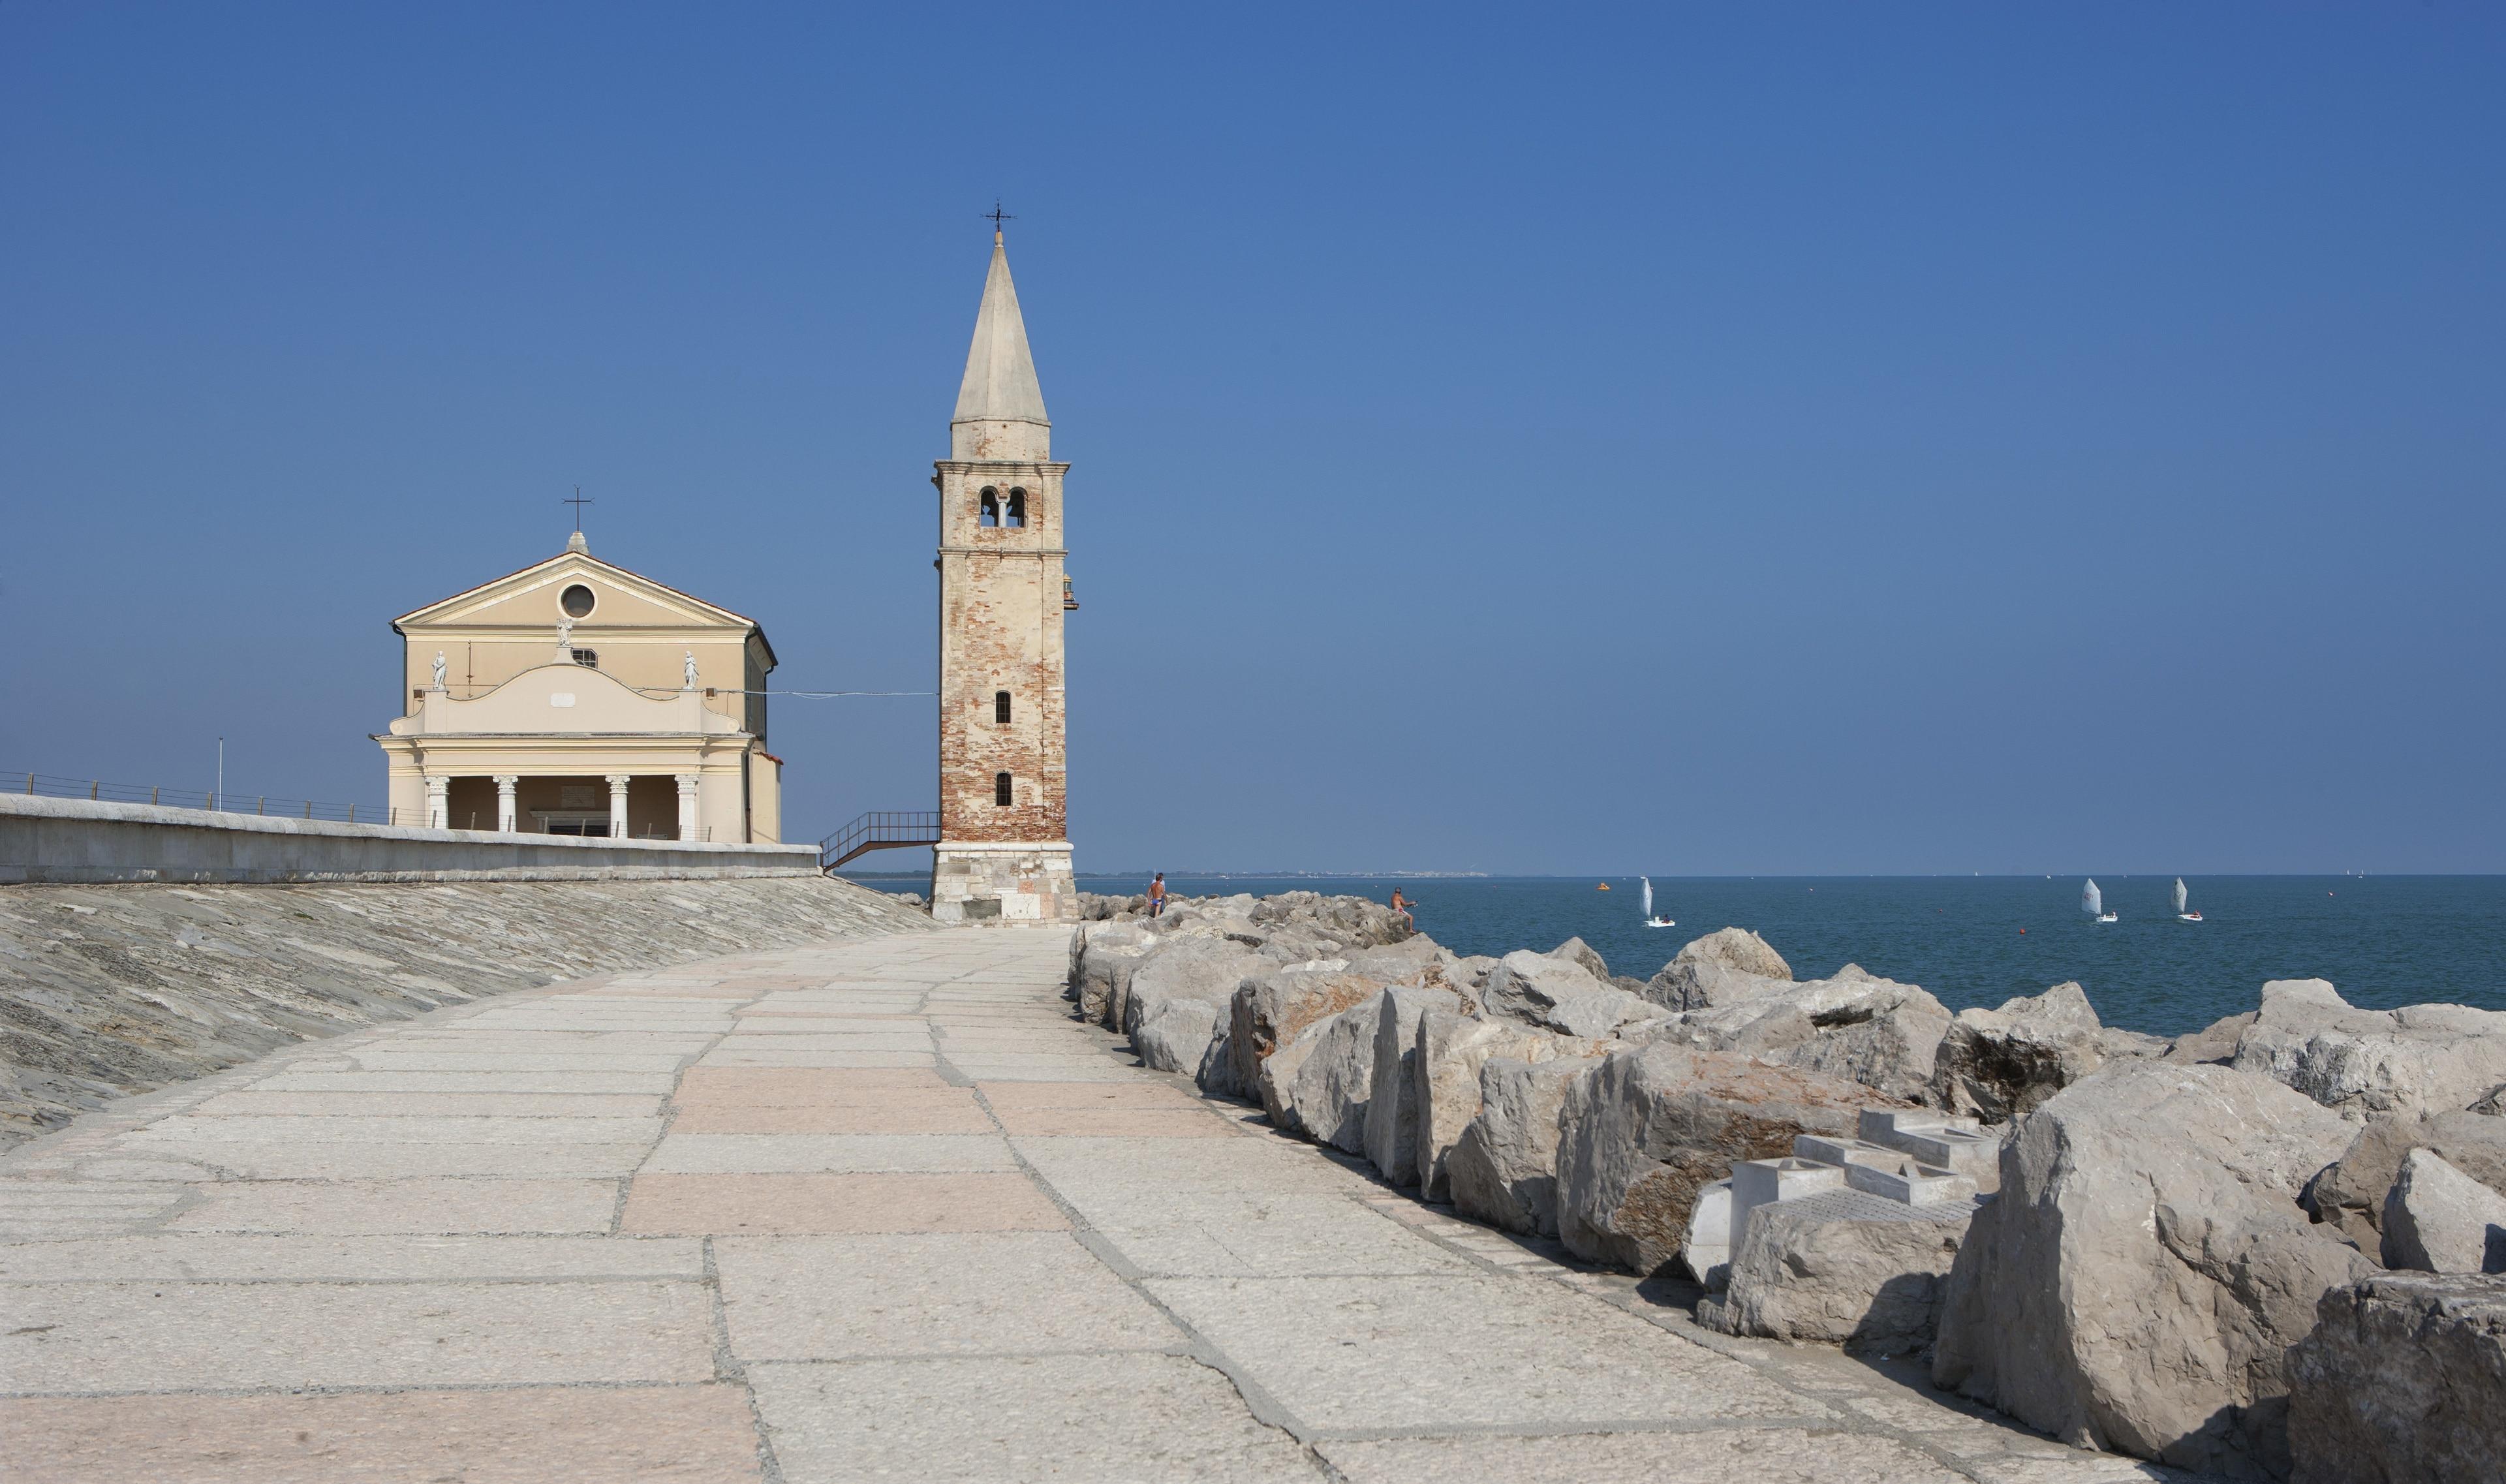 Santuario della Madonna dell'Angelo, Bova Marina, Kalabrien, Italien